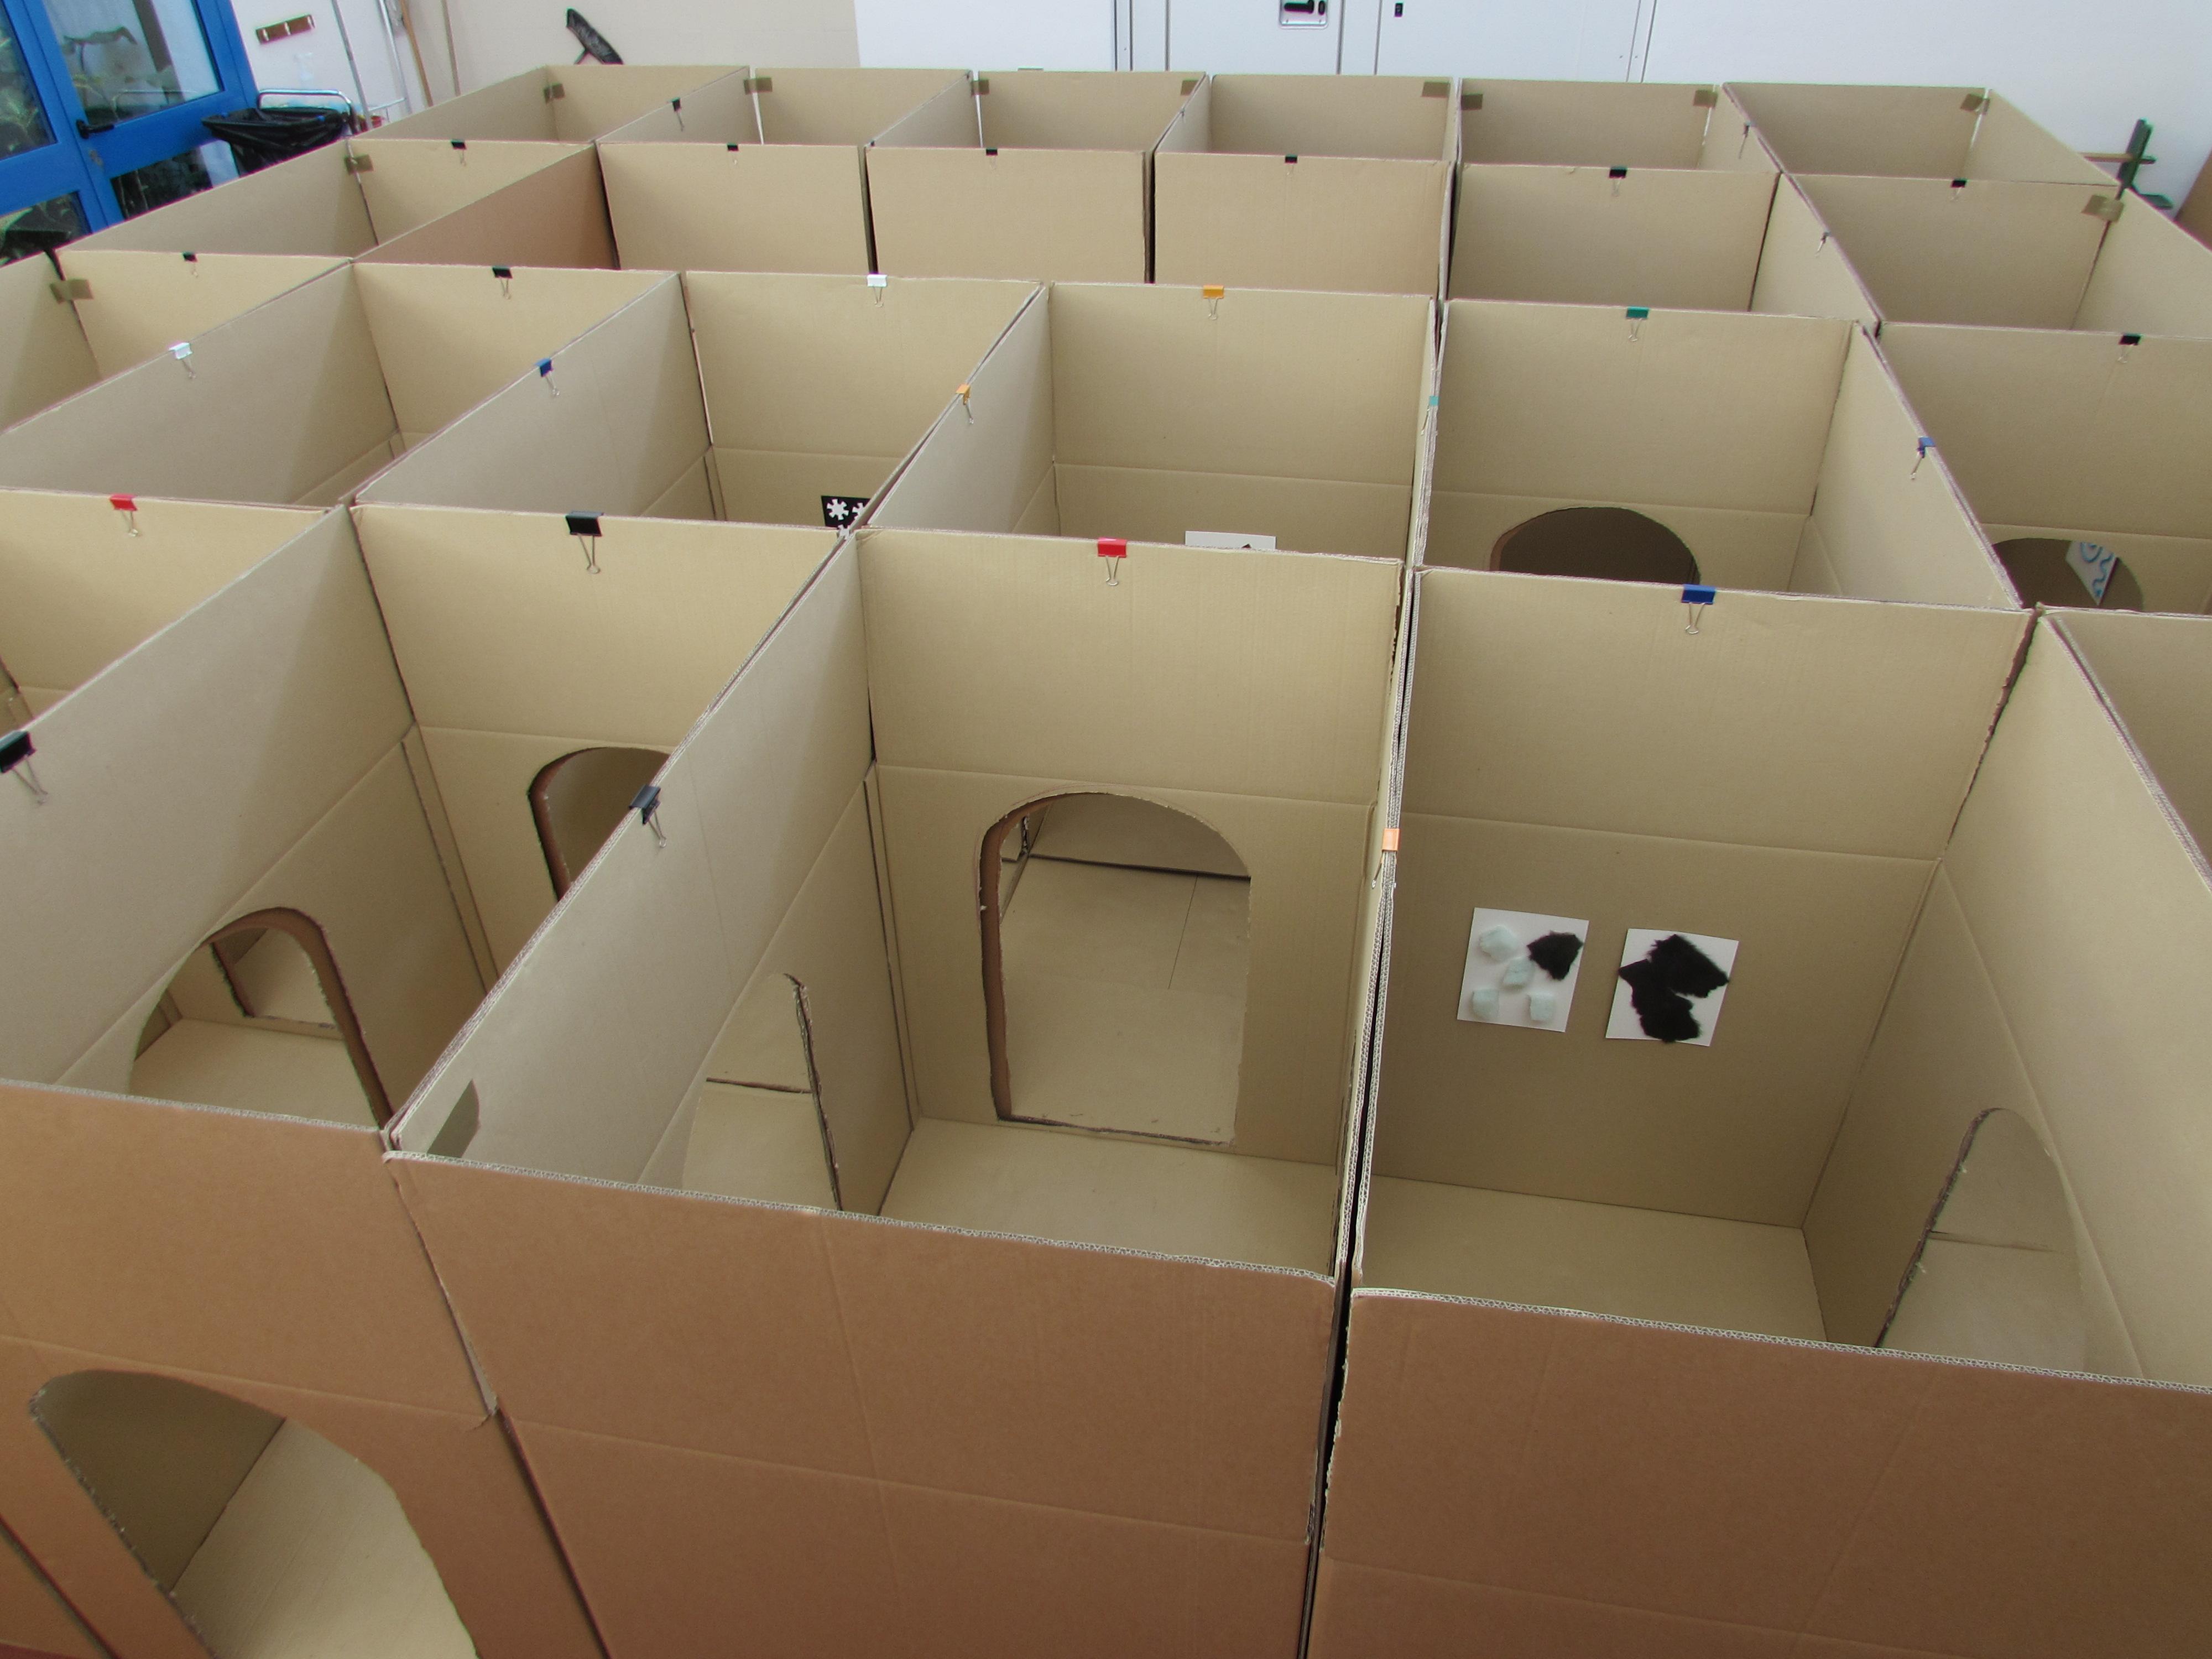 Labirinto tattile in cartone